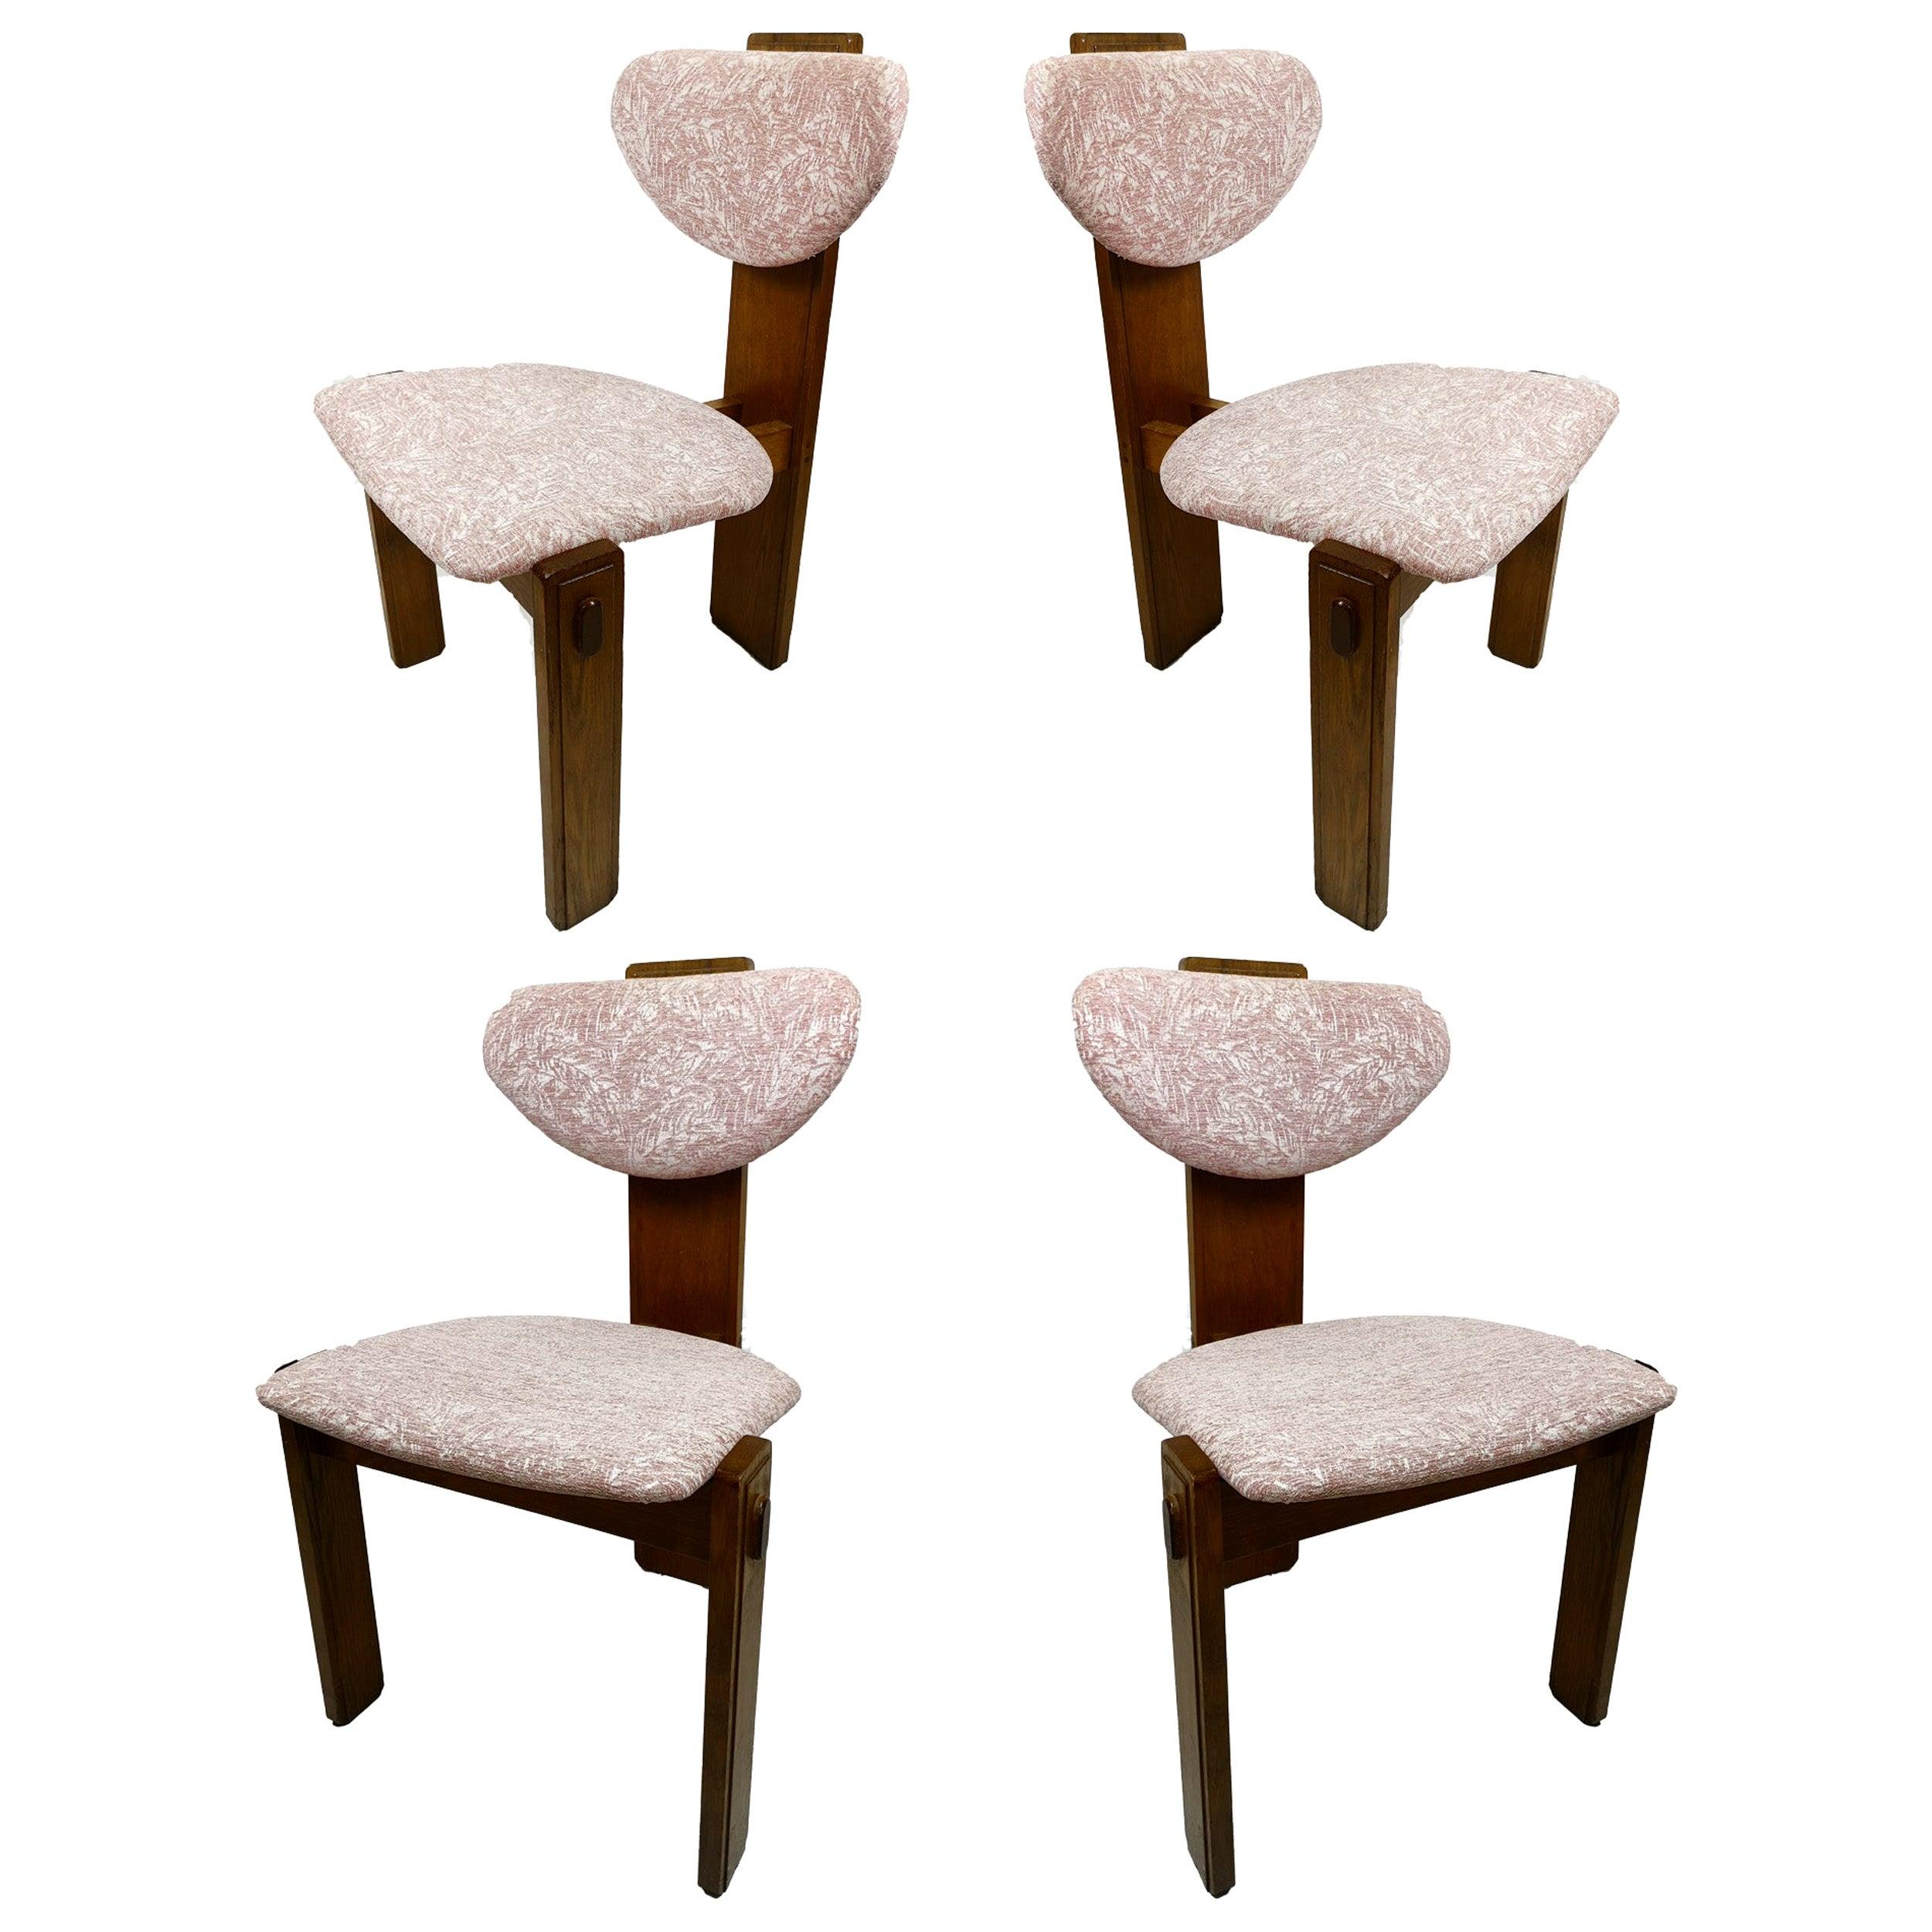 Set of Brutalist Midcentury Armchairs, 1950s